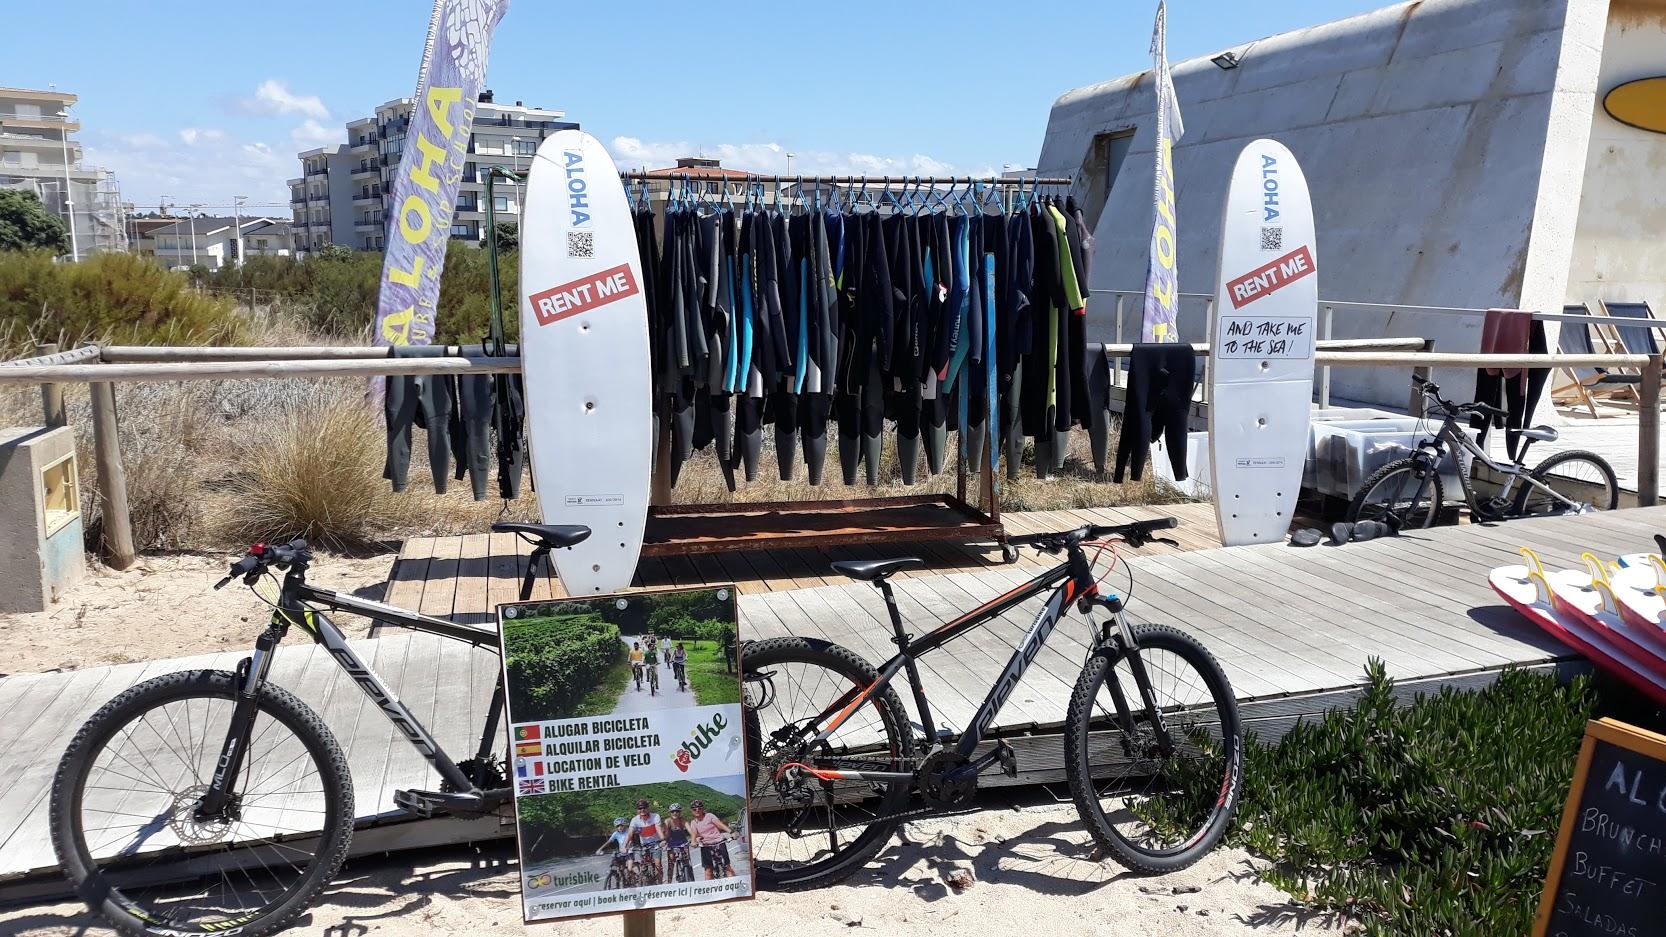 Mountain Bike and Surf at Azurara Beach Vila do Conde